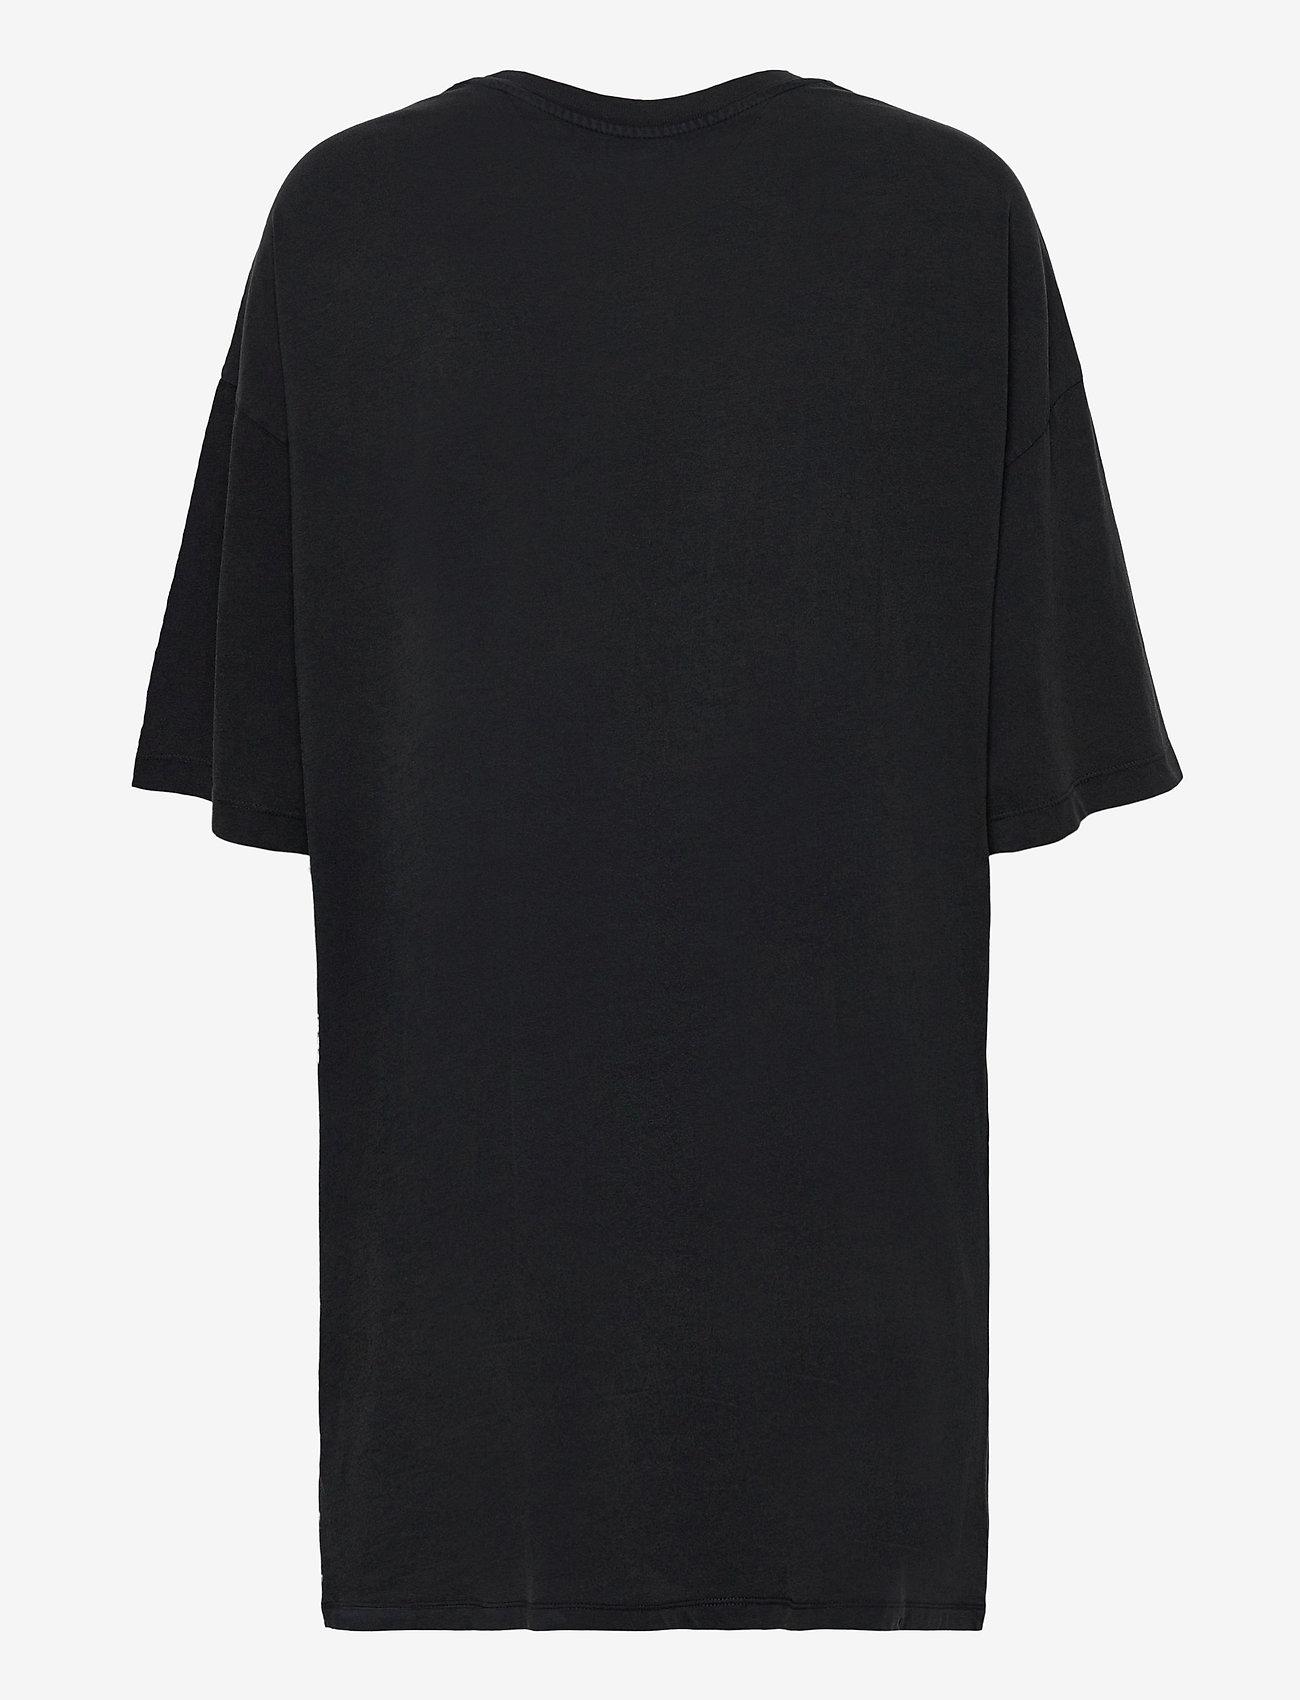 Tommy Jeans - TJW VINTAGE GRAPHIC TEE DRESS - sommarklänningar - black - 1